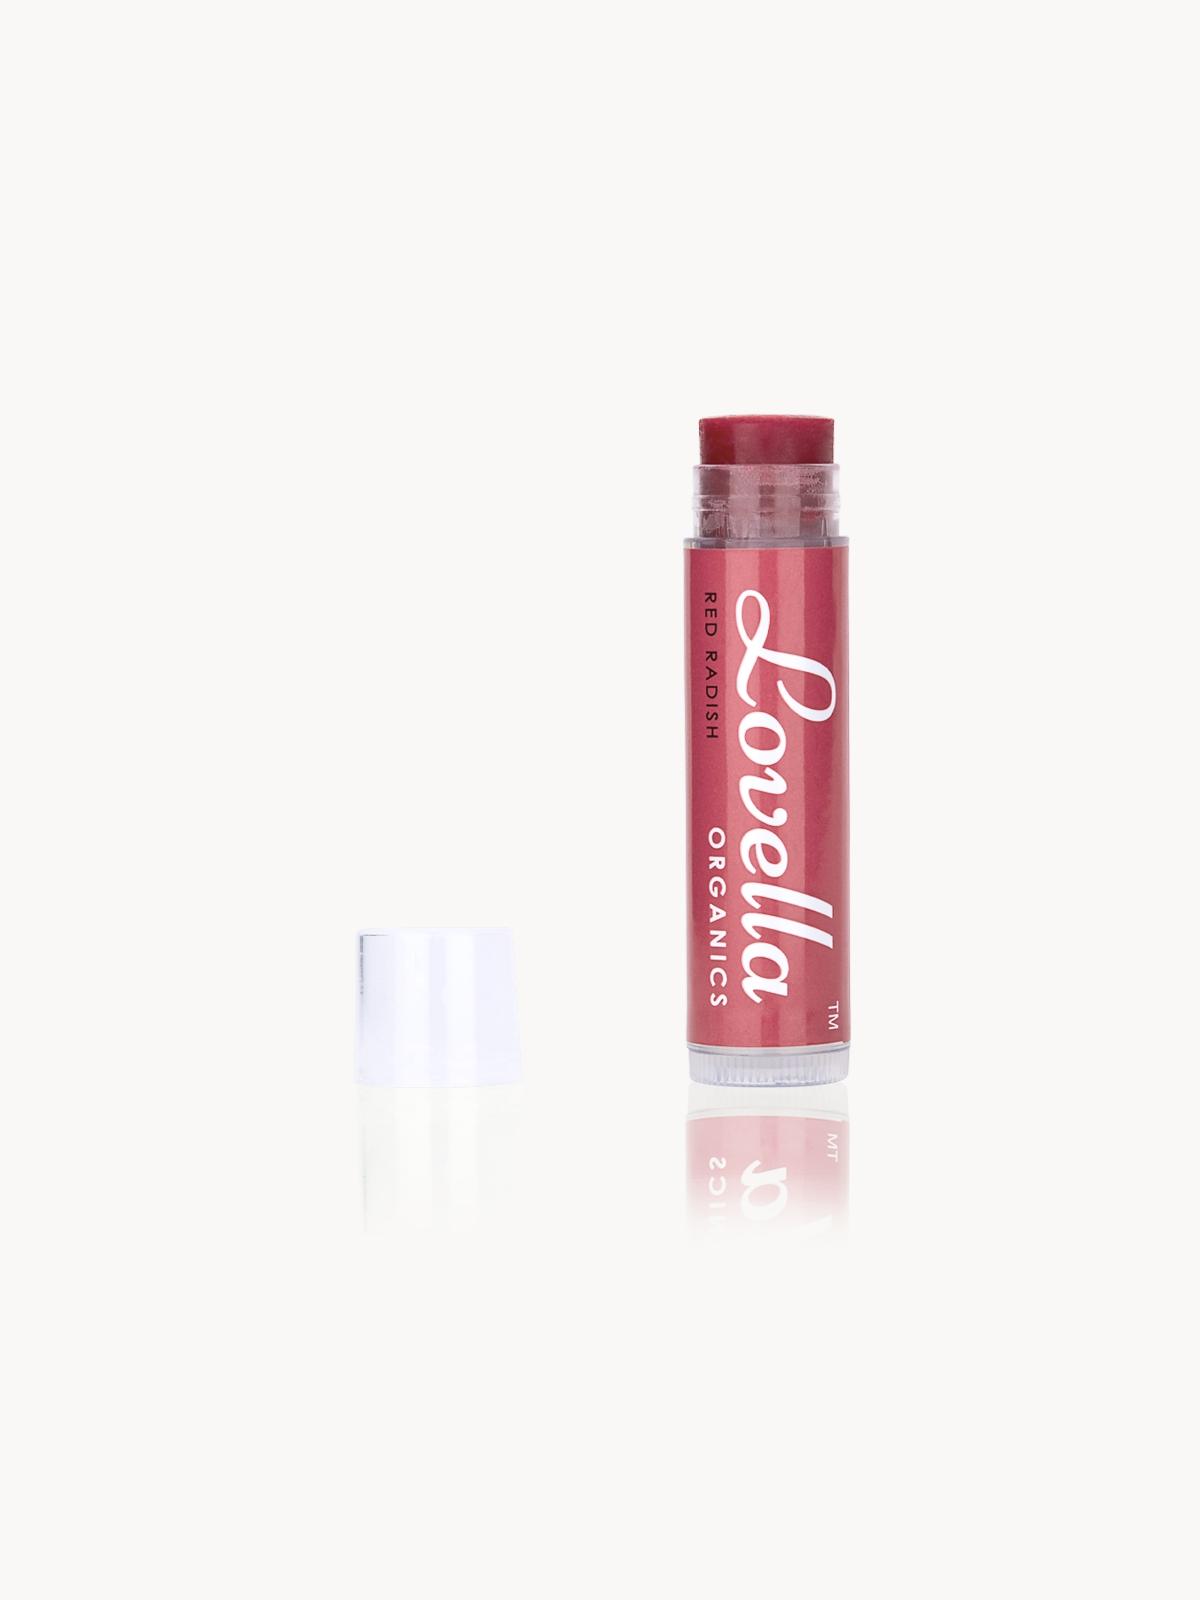 Lovella Organics Healthy Tinted Lip Balm Red Radish